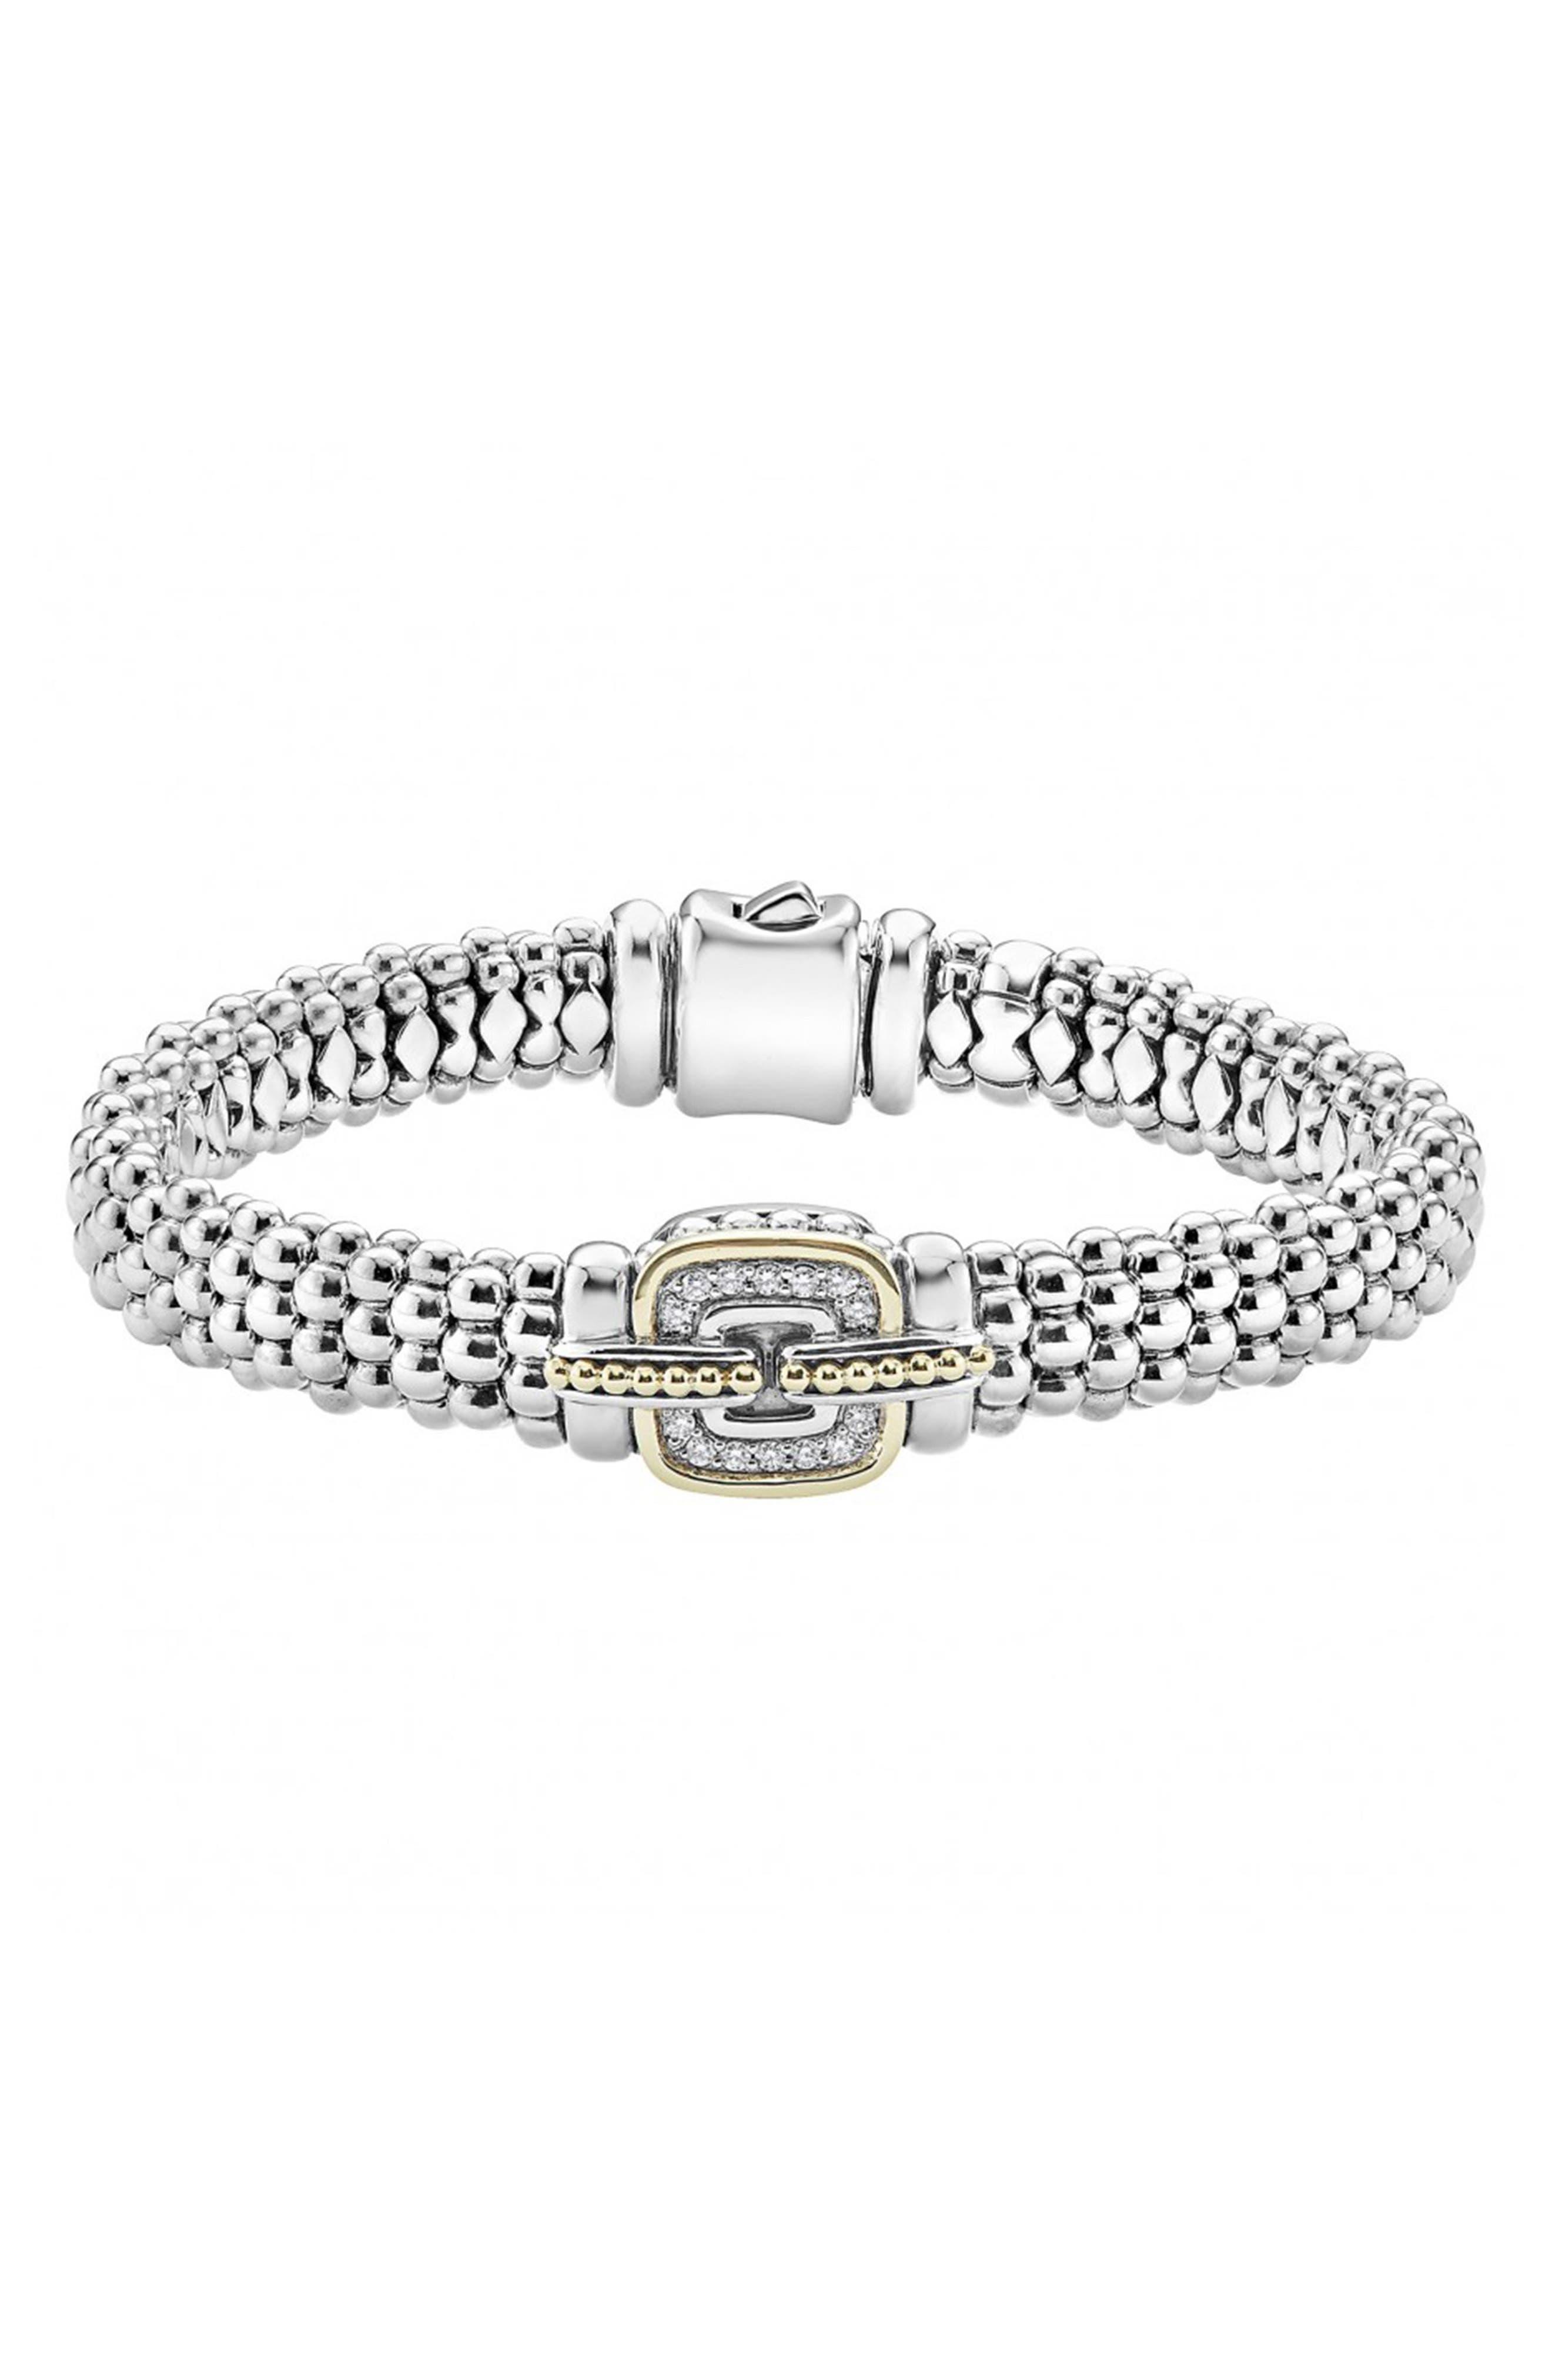 Cushion Caviar Bracelet,                             Main thumbnail 1, color,                             SILVER/ GOLD